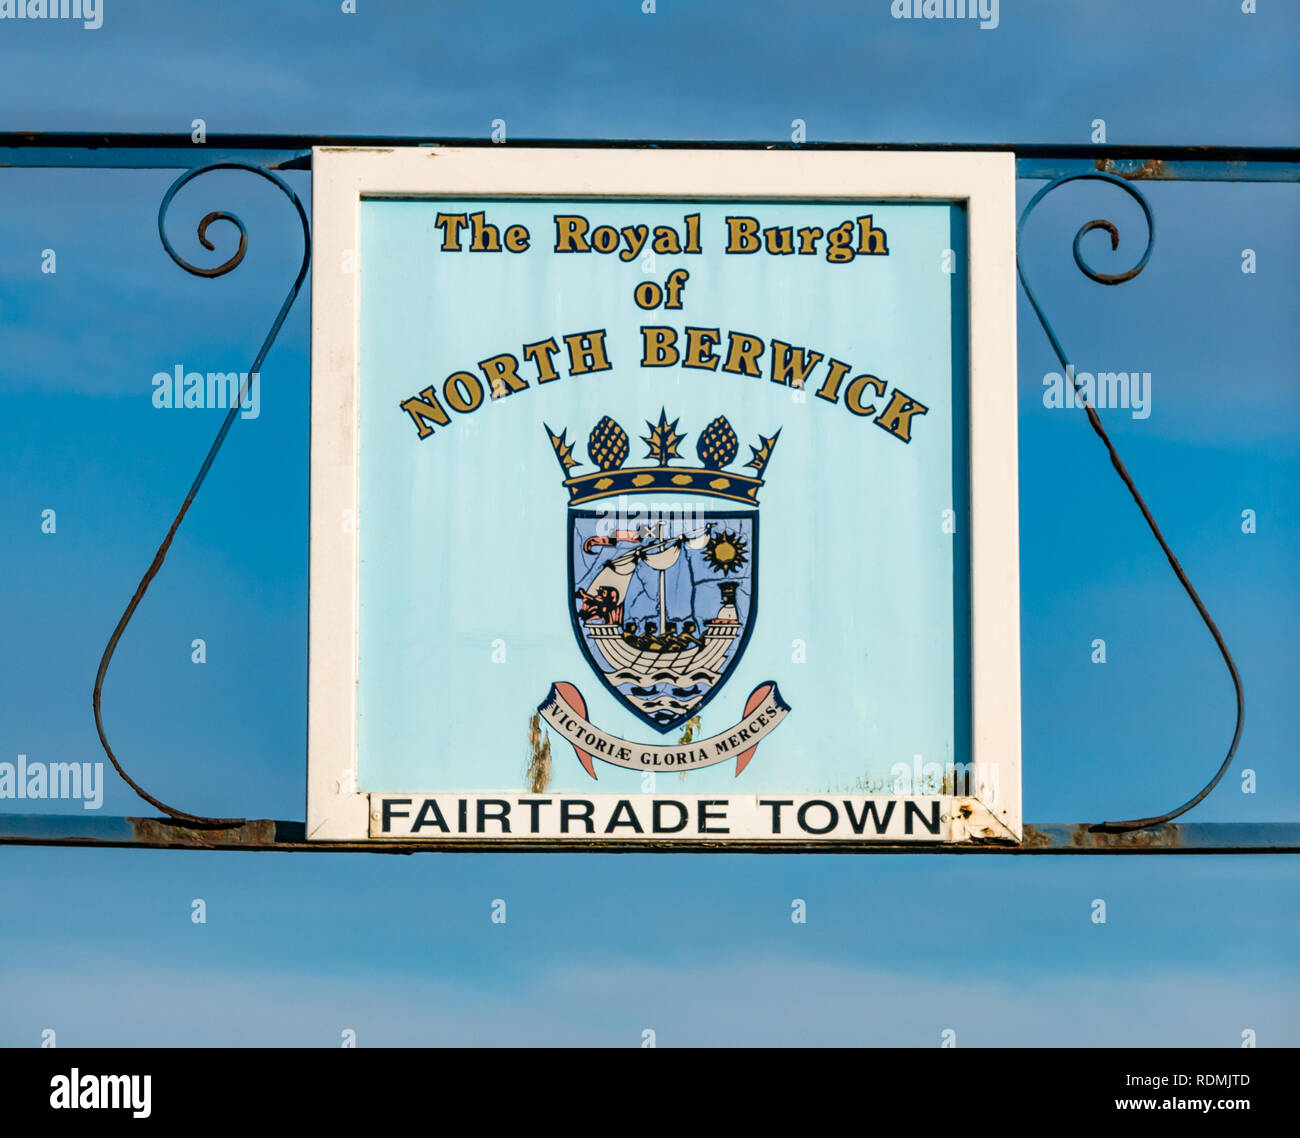 Roadside worn sign on road into North Berwick, with Royal Burgh of North Berwick, Faritrade Town, East Lothian, Scotland, UK - Stock Image